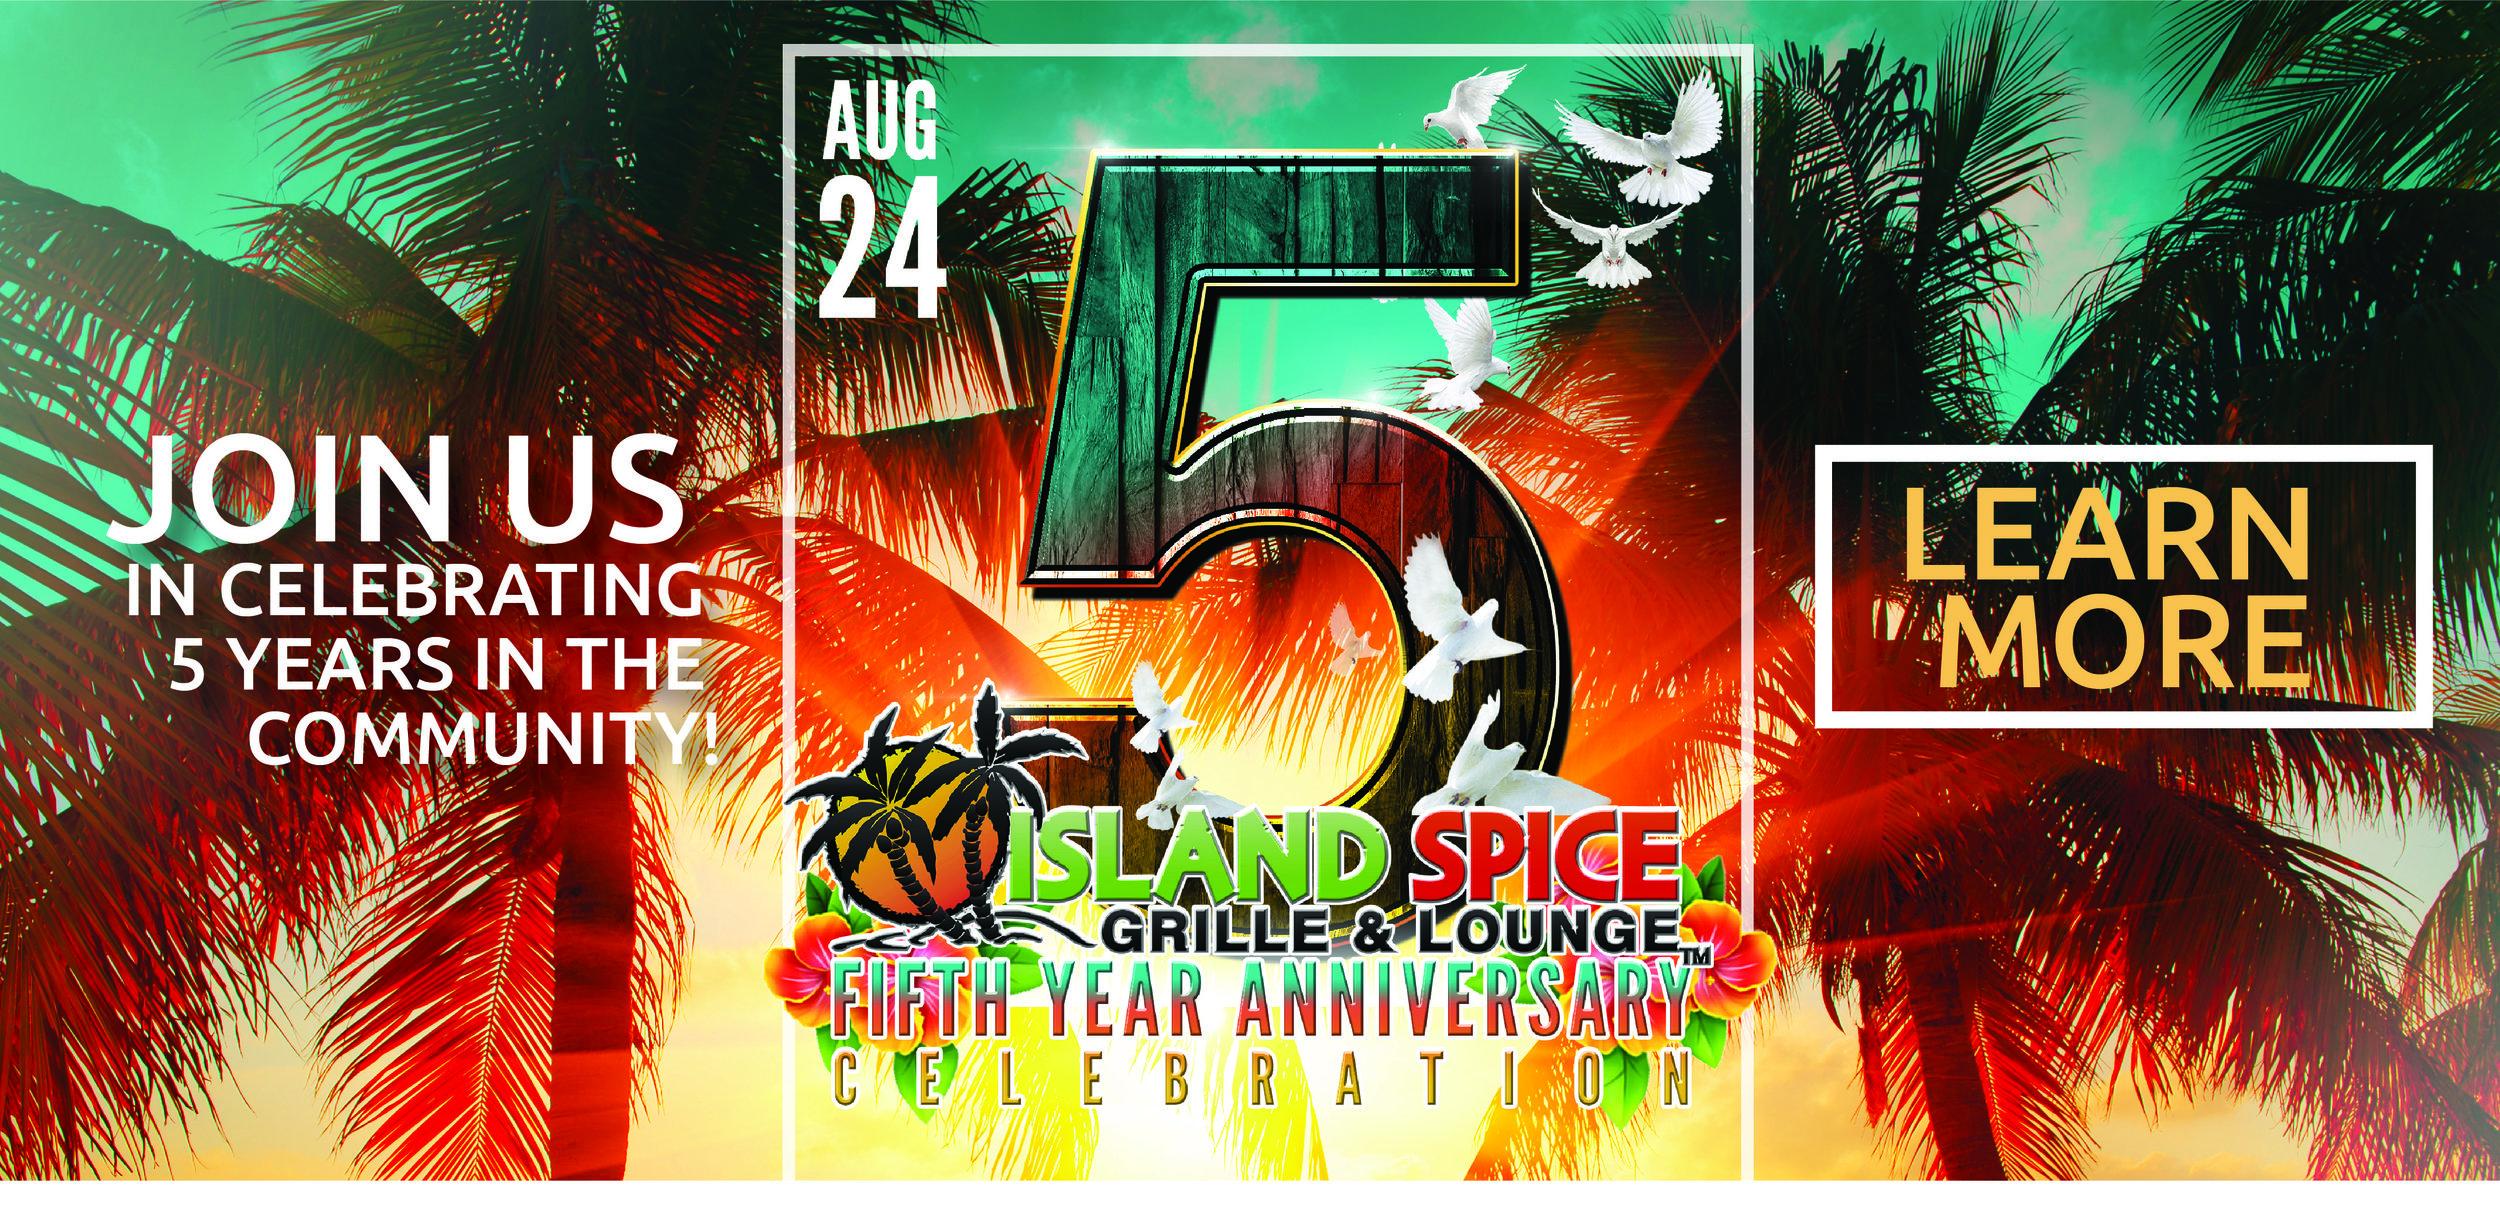 Island Spice Web Slides-02.jpg